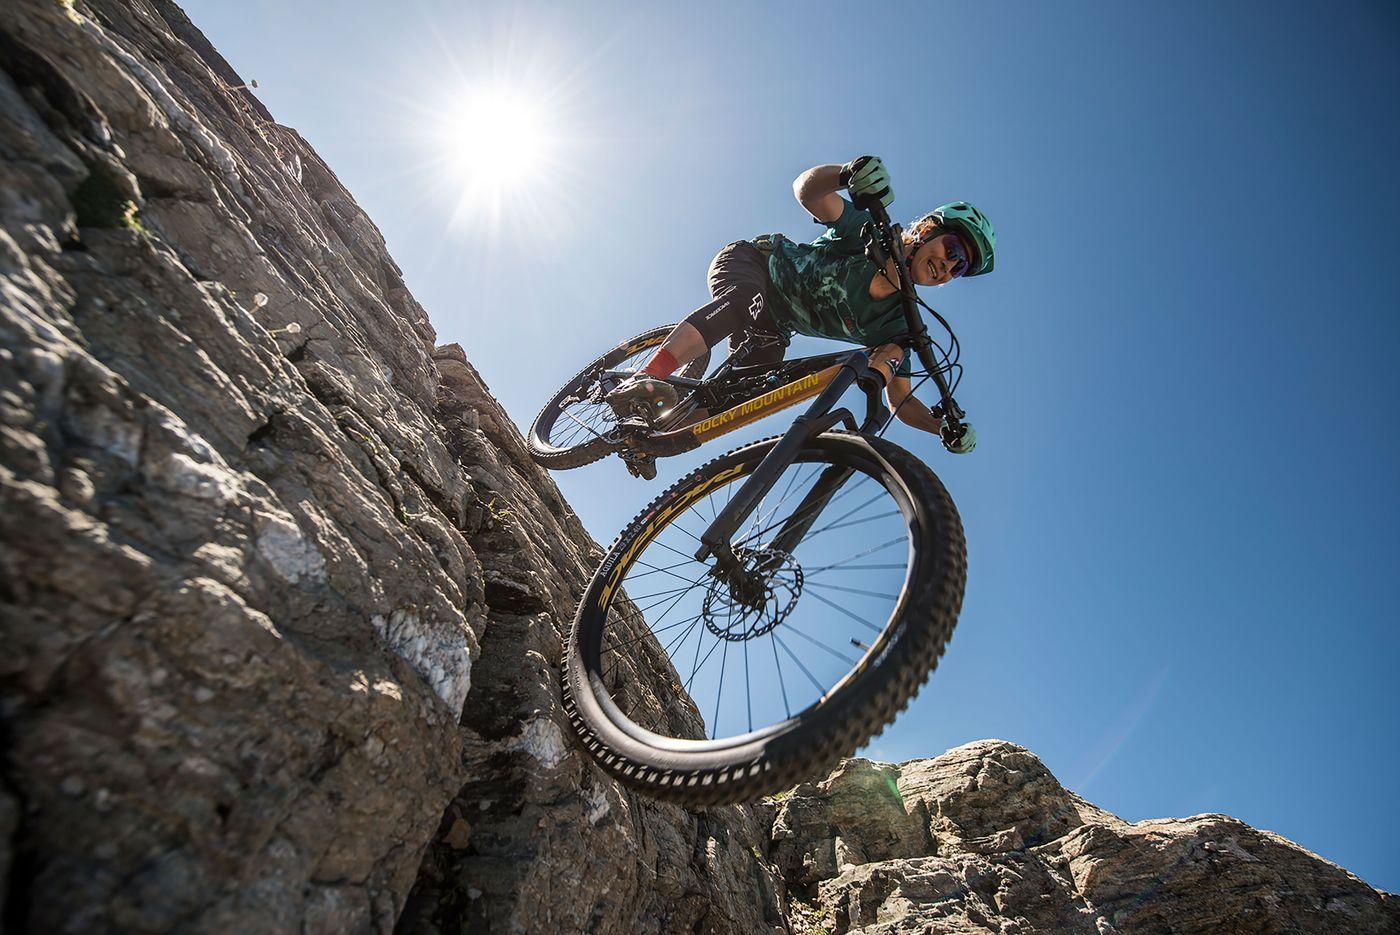 EgelmairPhotography_BikeKingdom_highres-7679